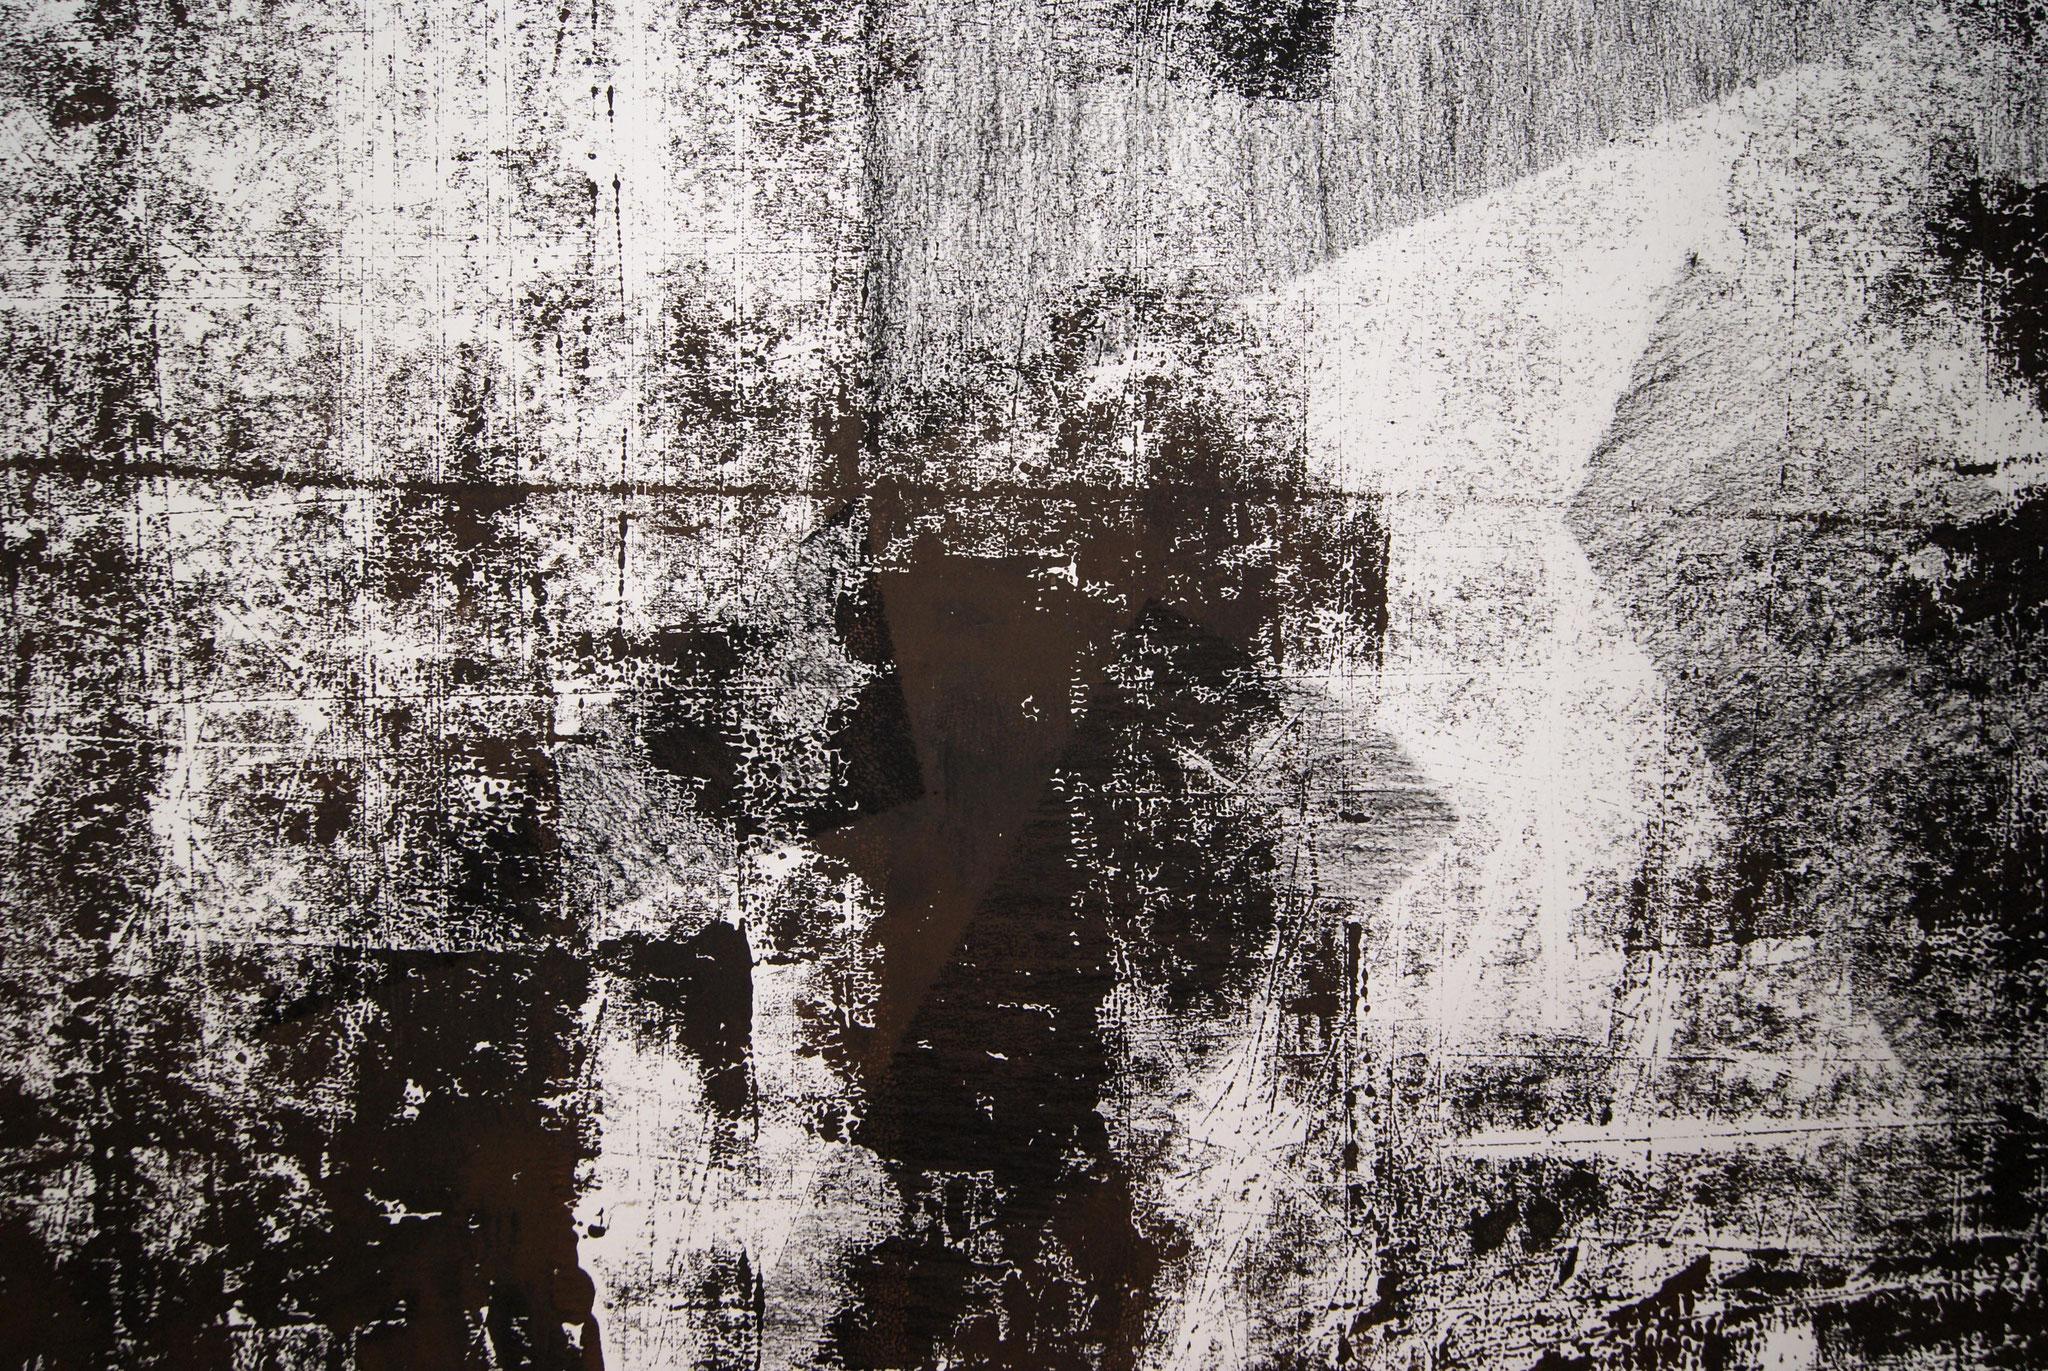 o.T. I, 2017, detail, 228 x 150cm linolprint